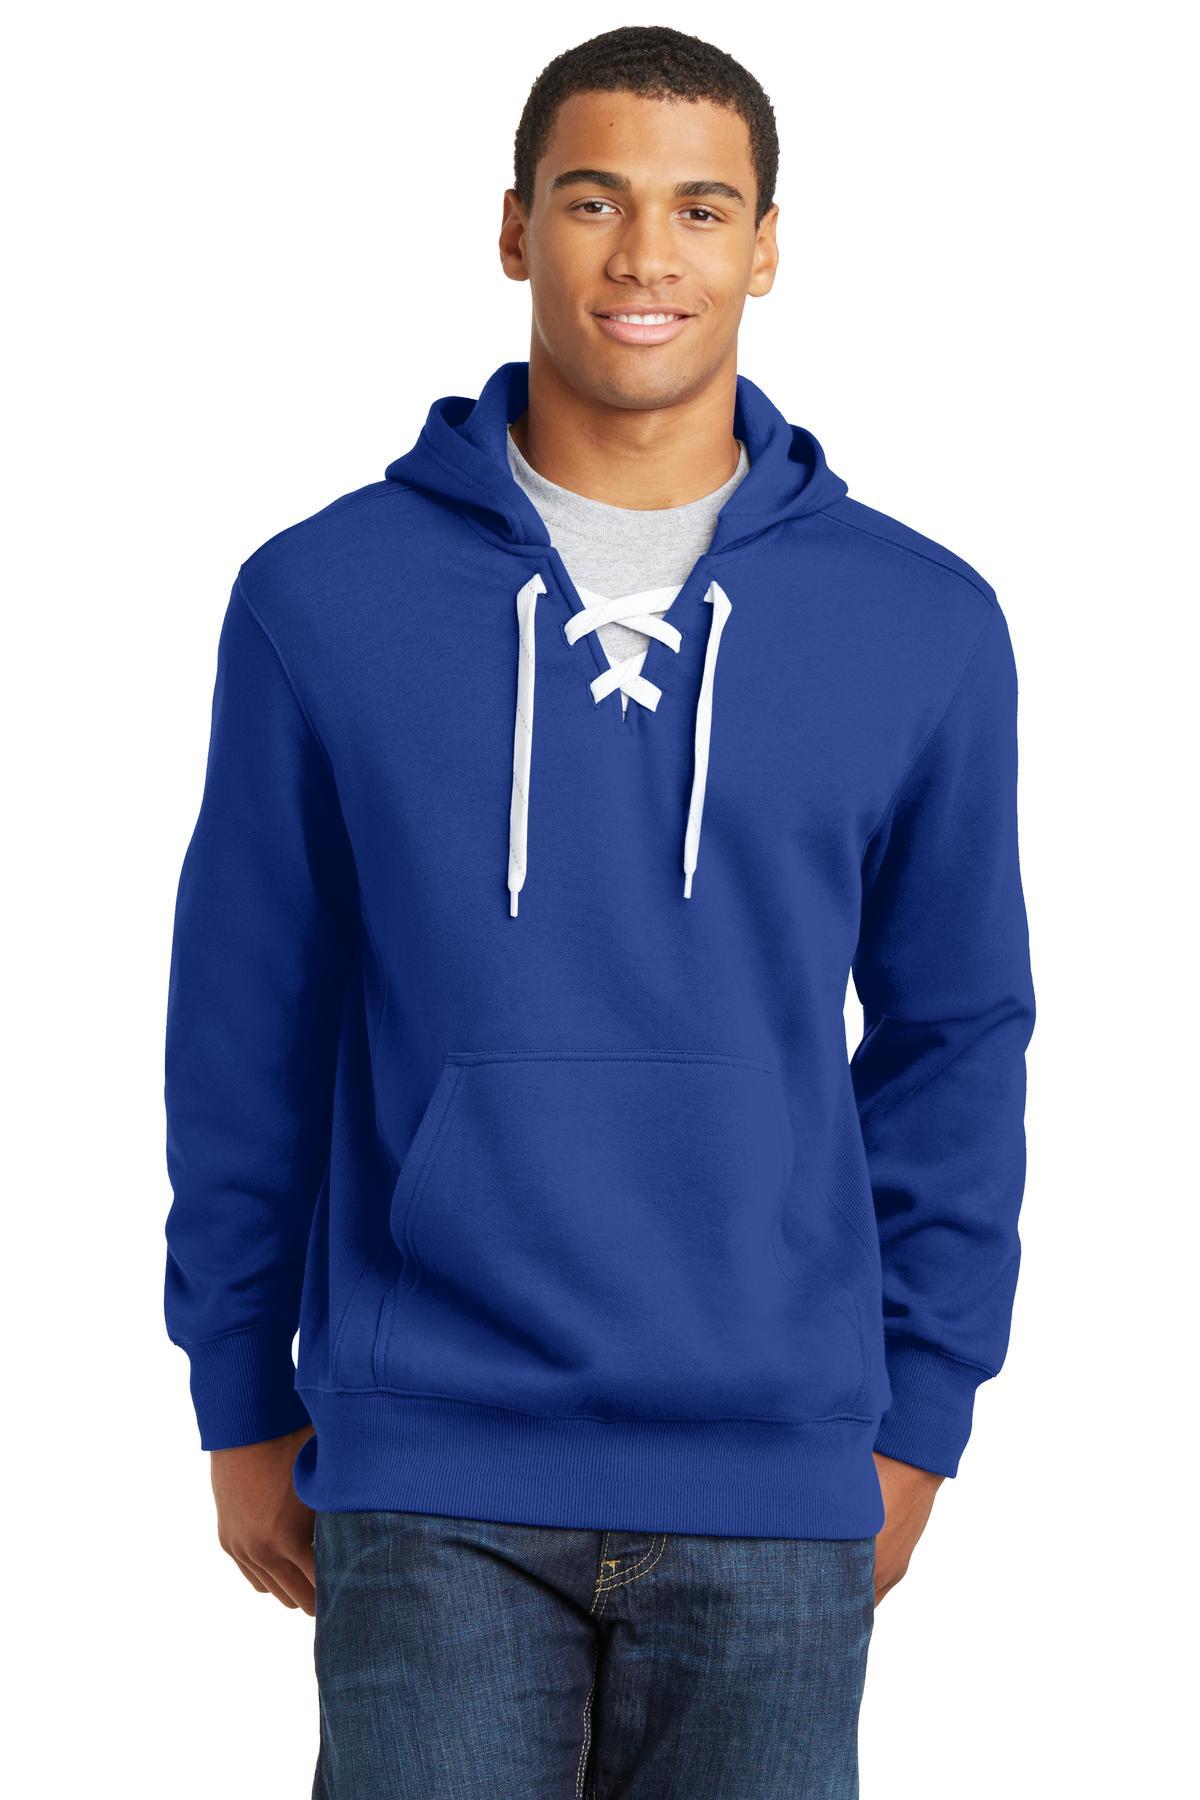 Sport Tek 174 St271 Lace Up Pullover Hooded Sweatshirt